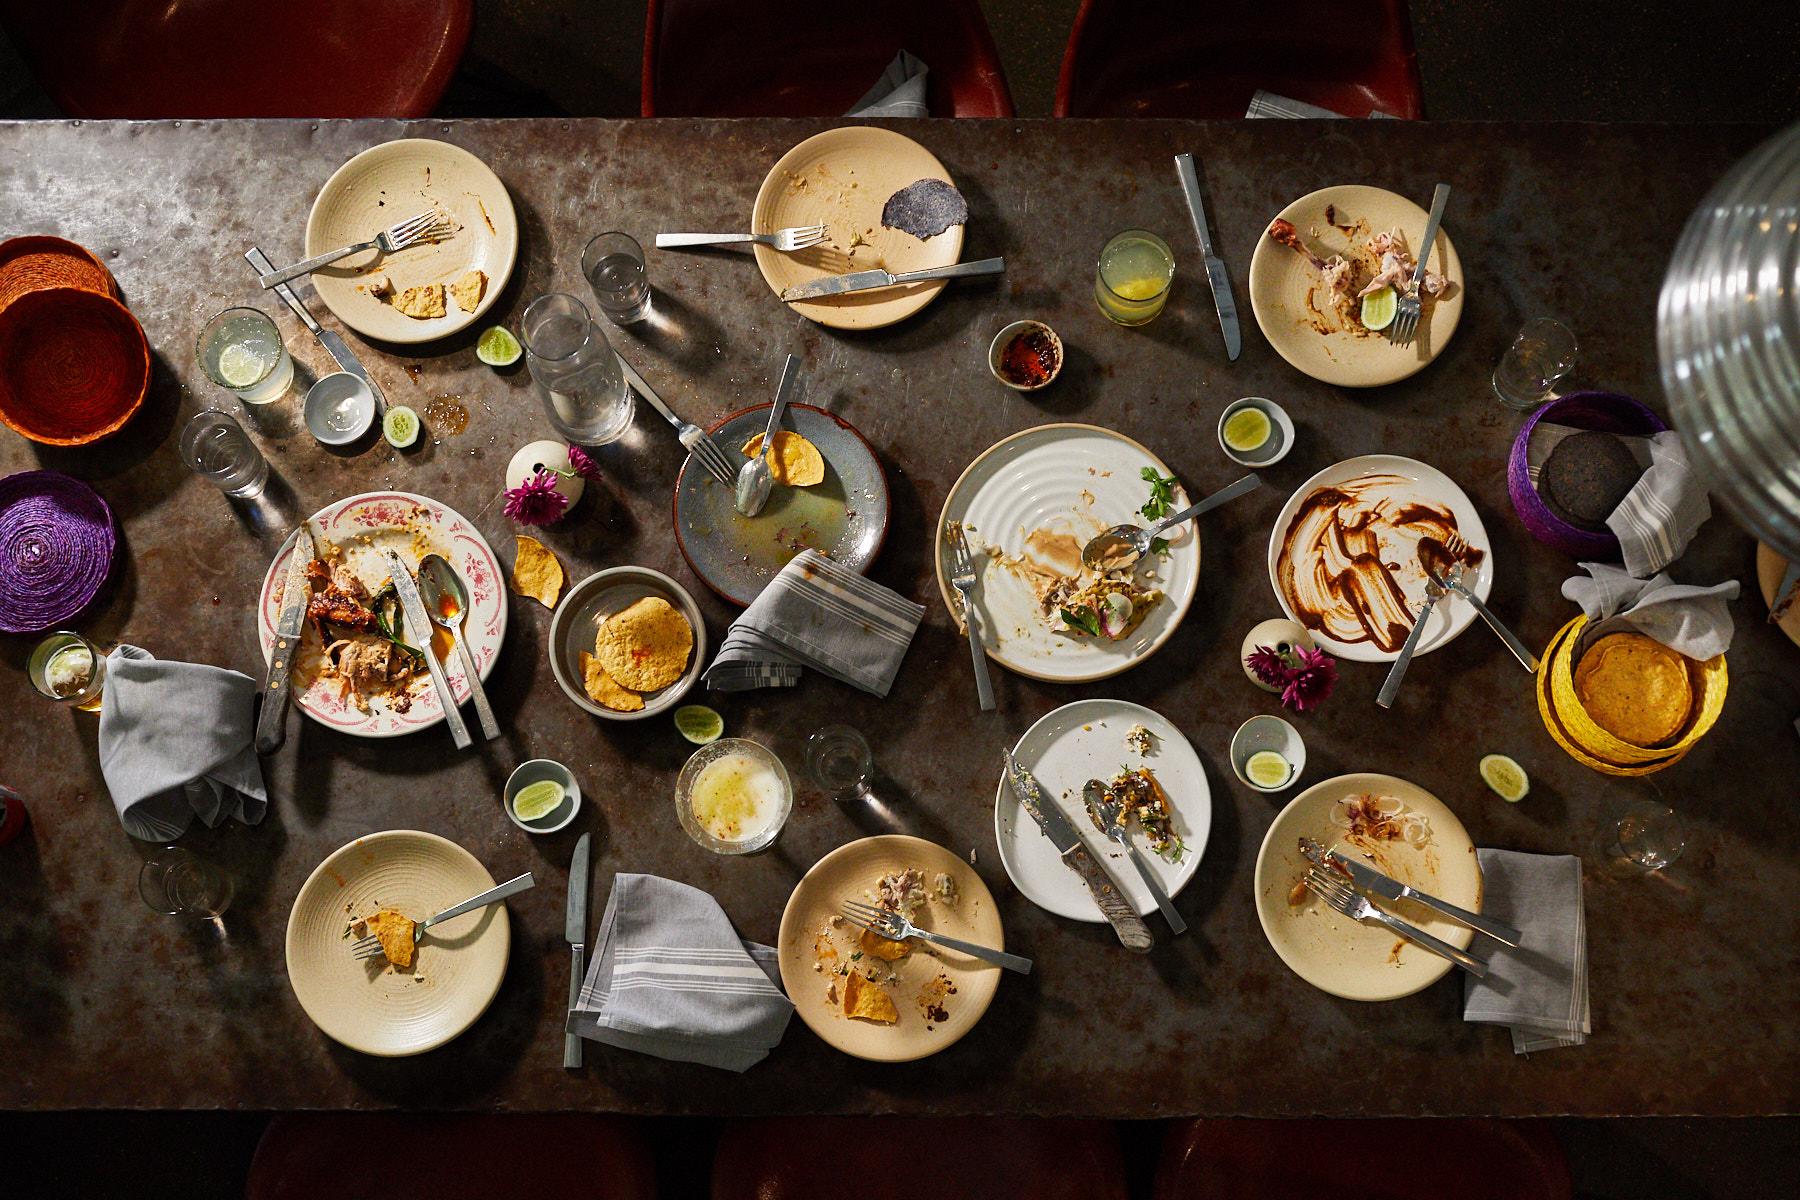 phoode, Jody Horton food photography, editorial food photography, food magazine photography, restaurant photography, jody horton